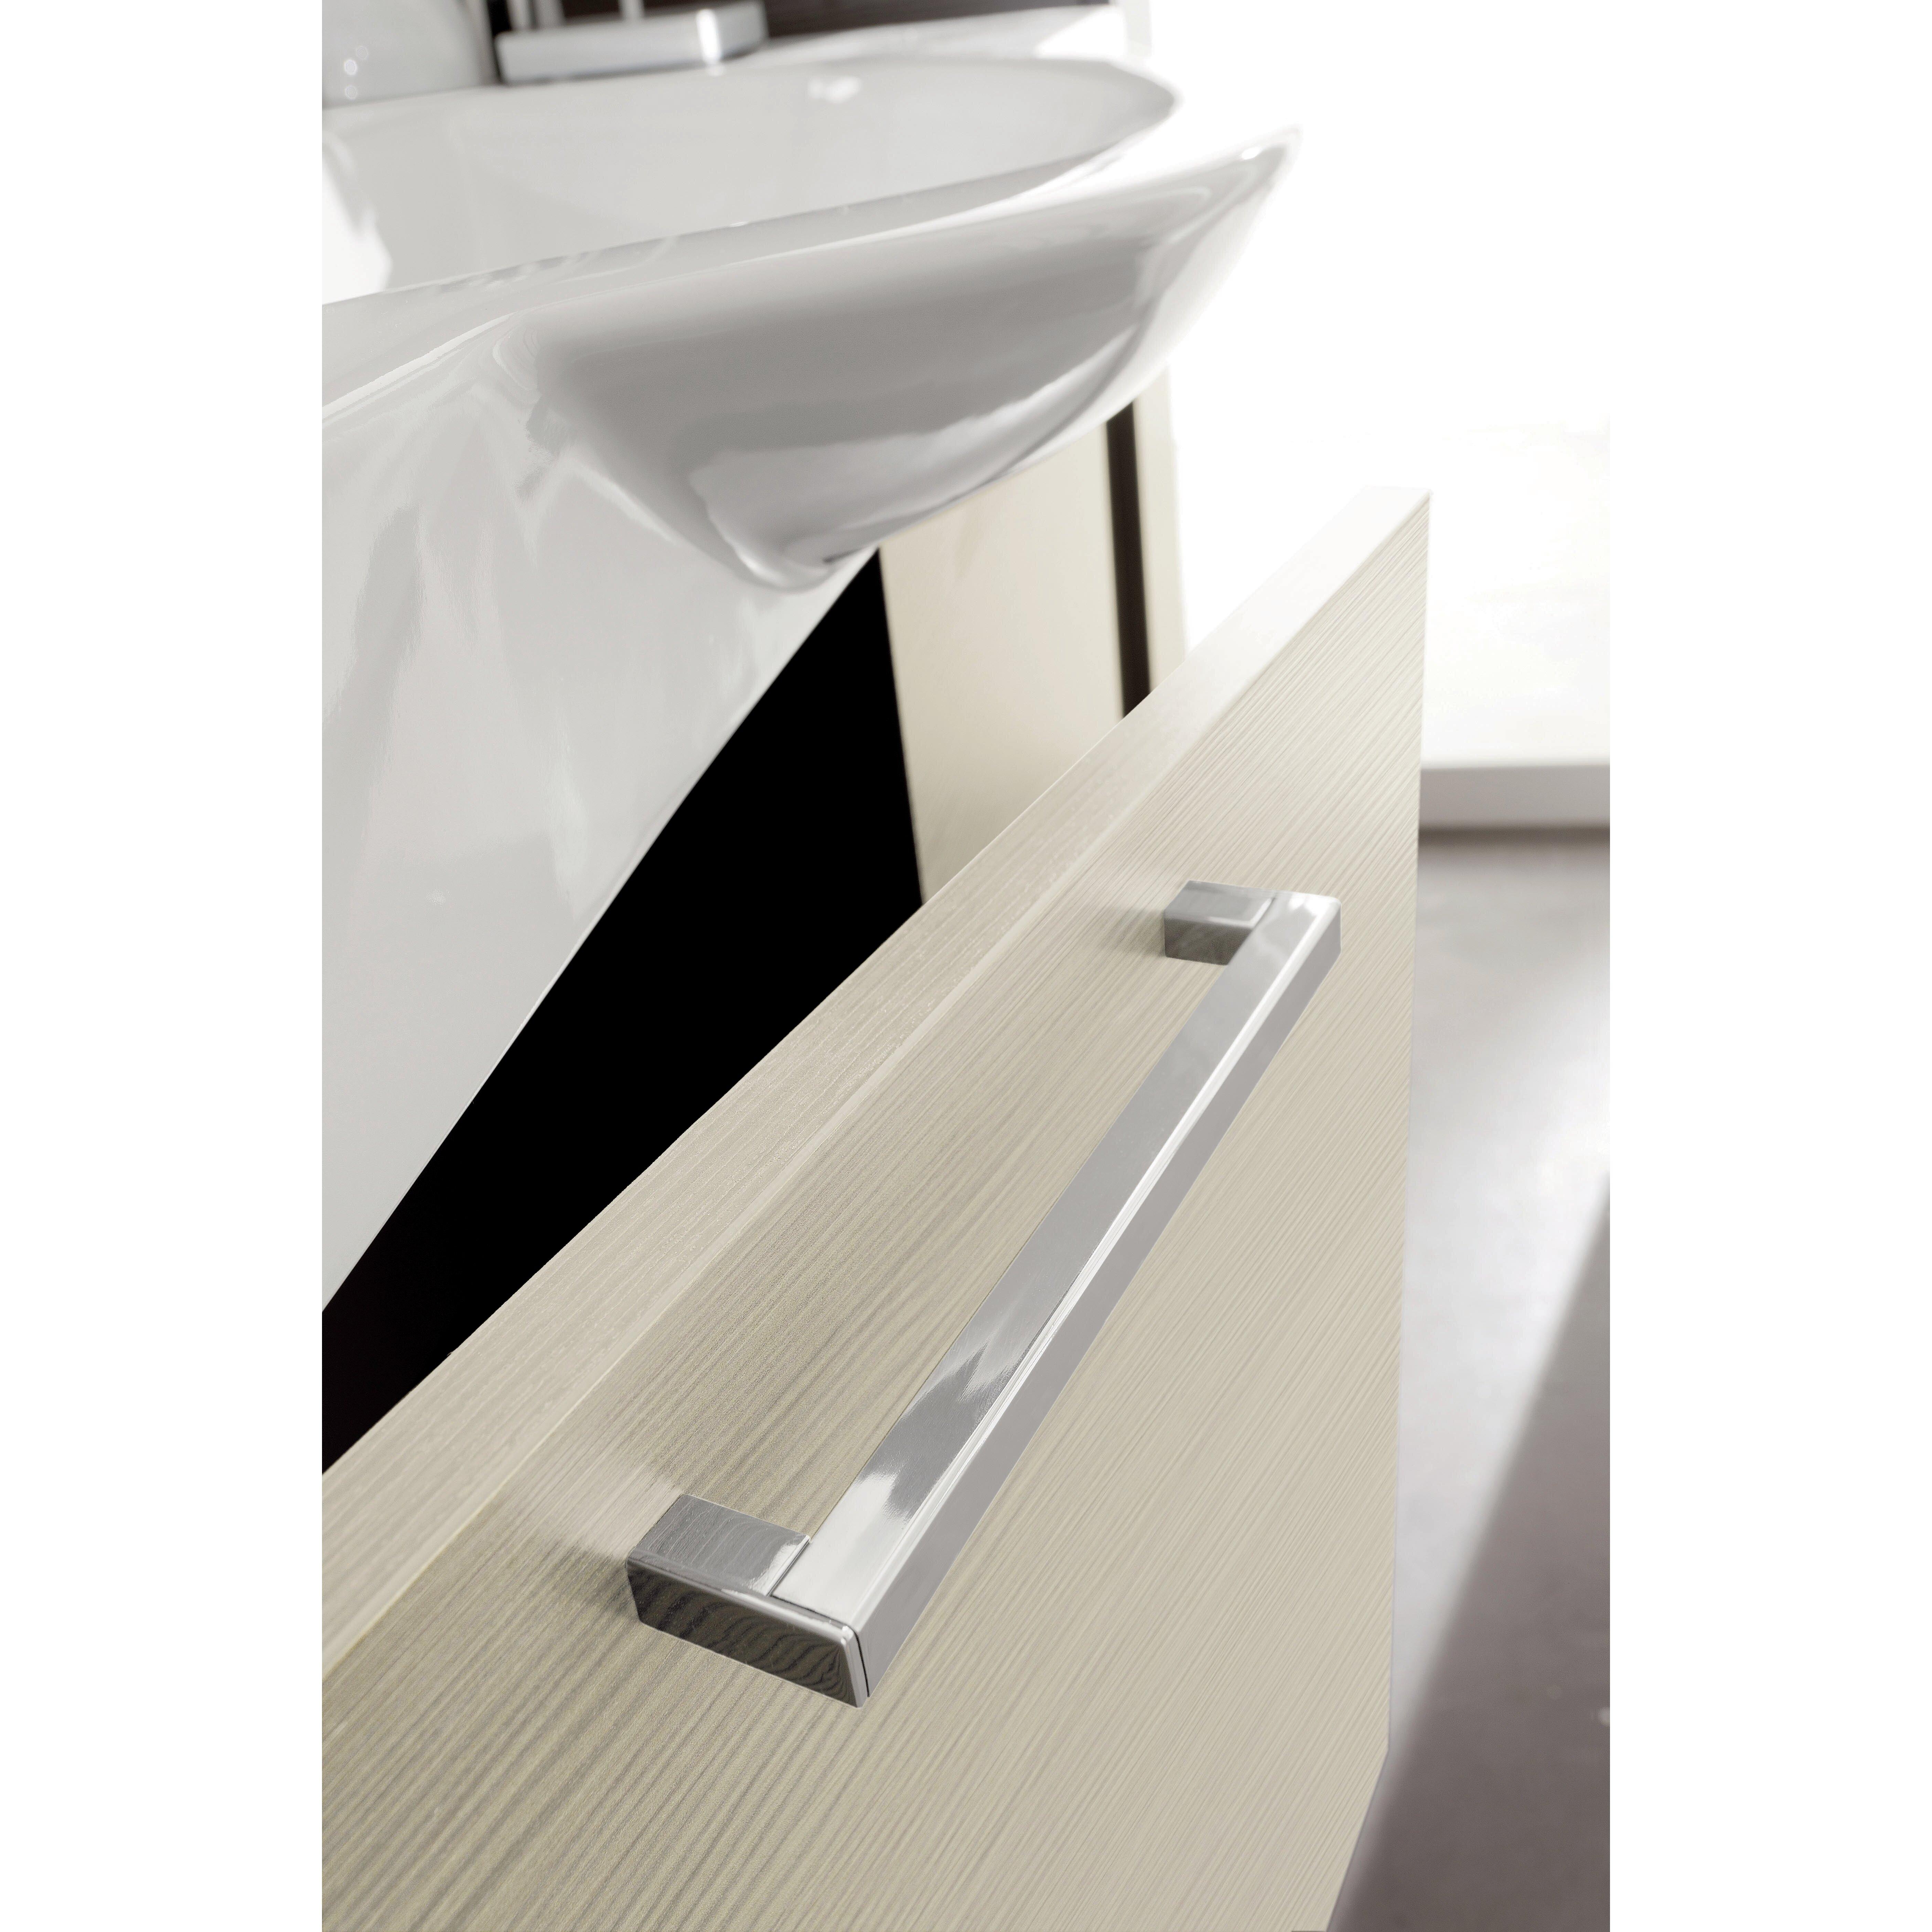 Excellent Industrial Bathroom Fixture Set Towel Bar Hand By KingWoodworks